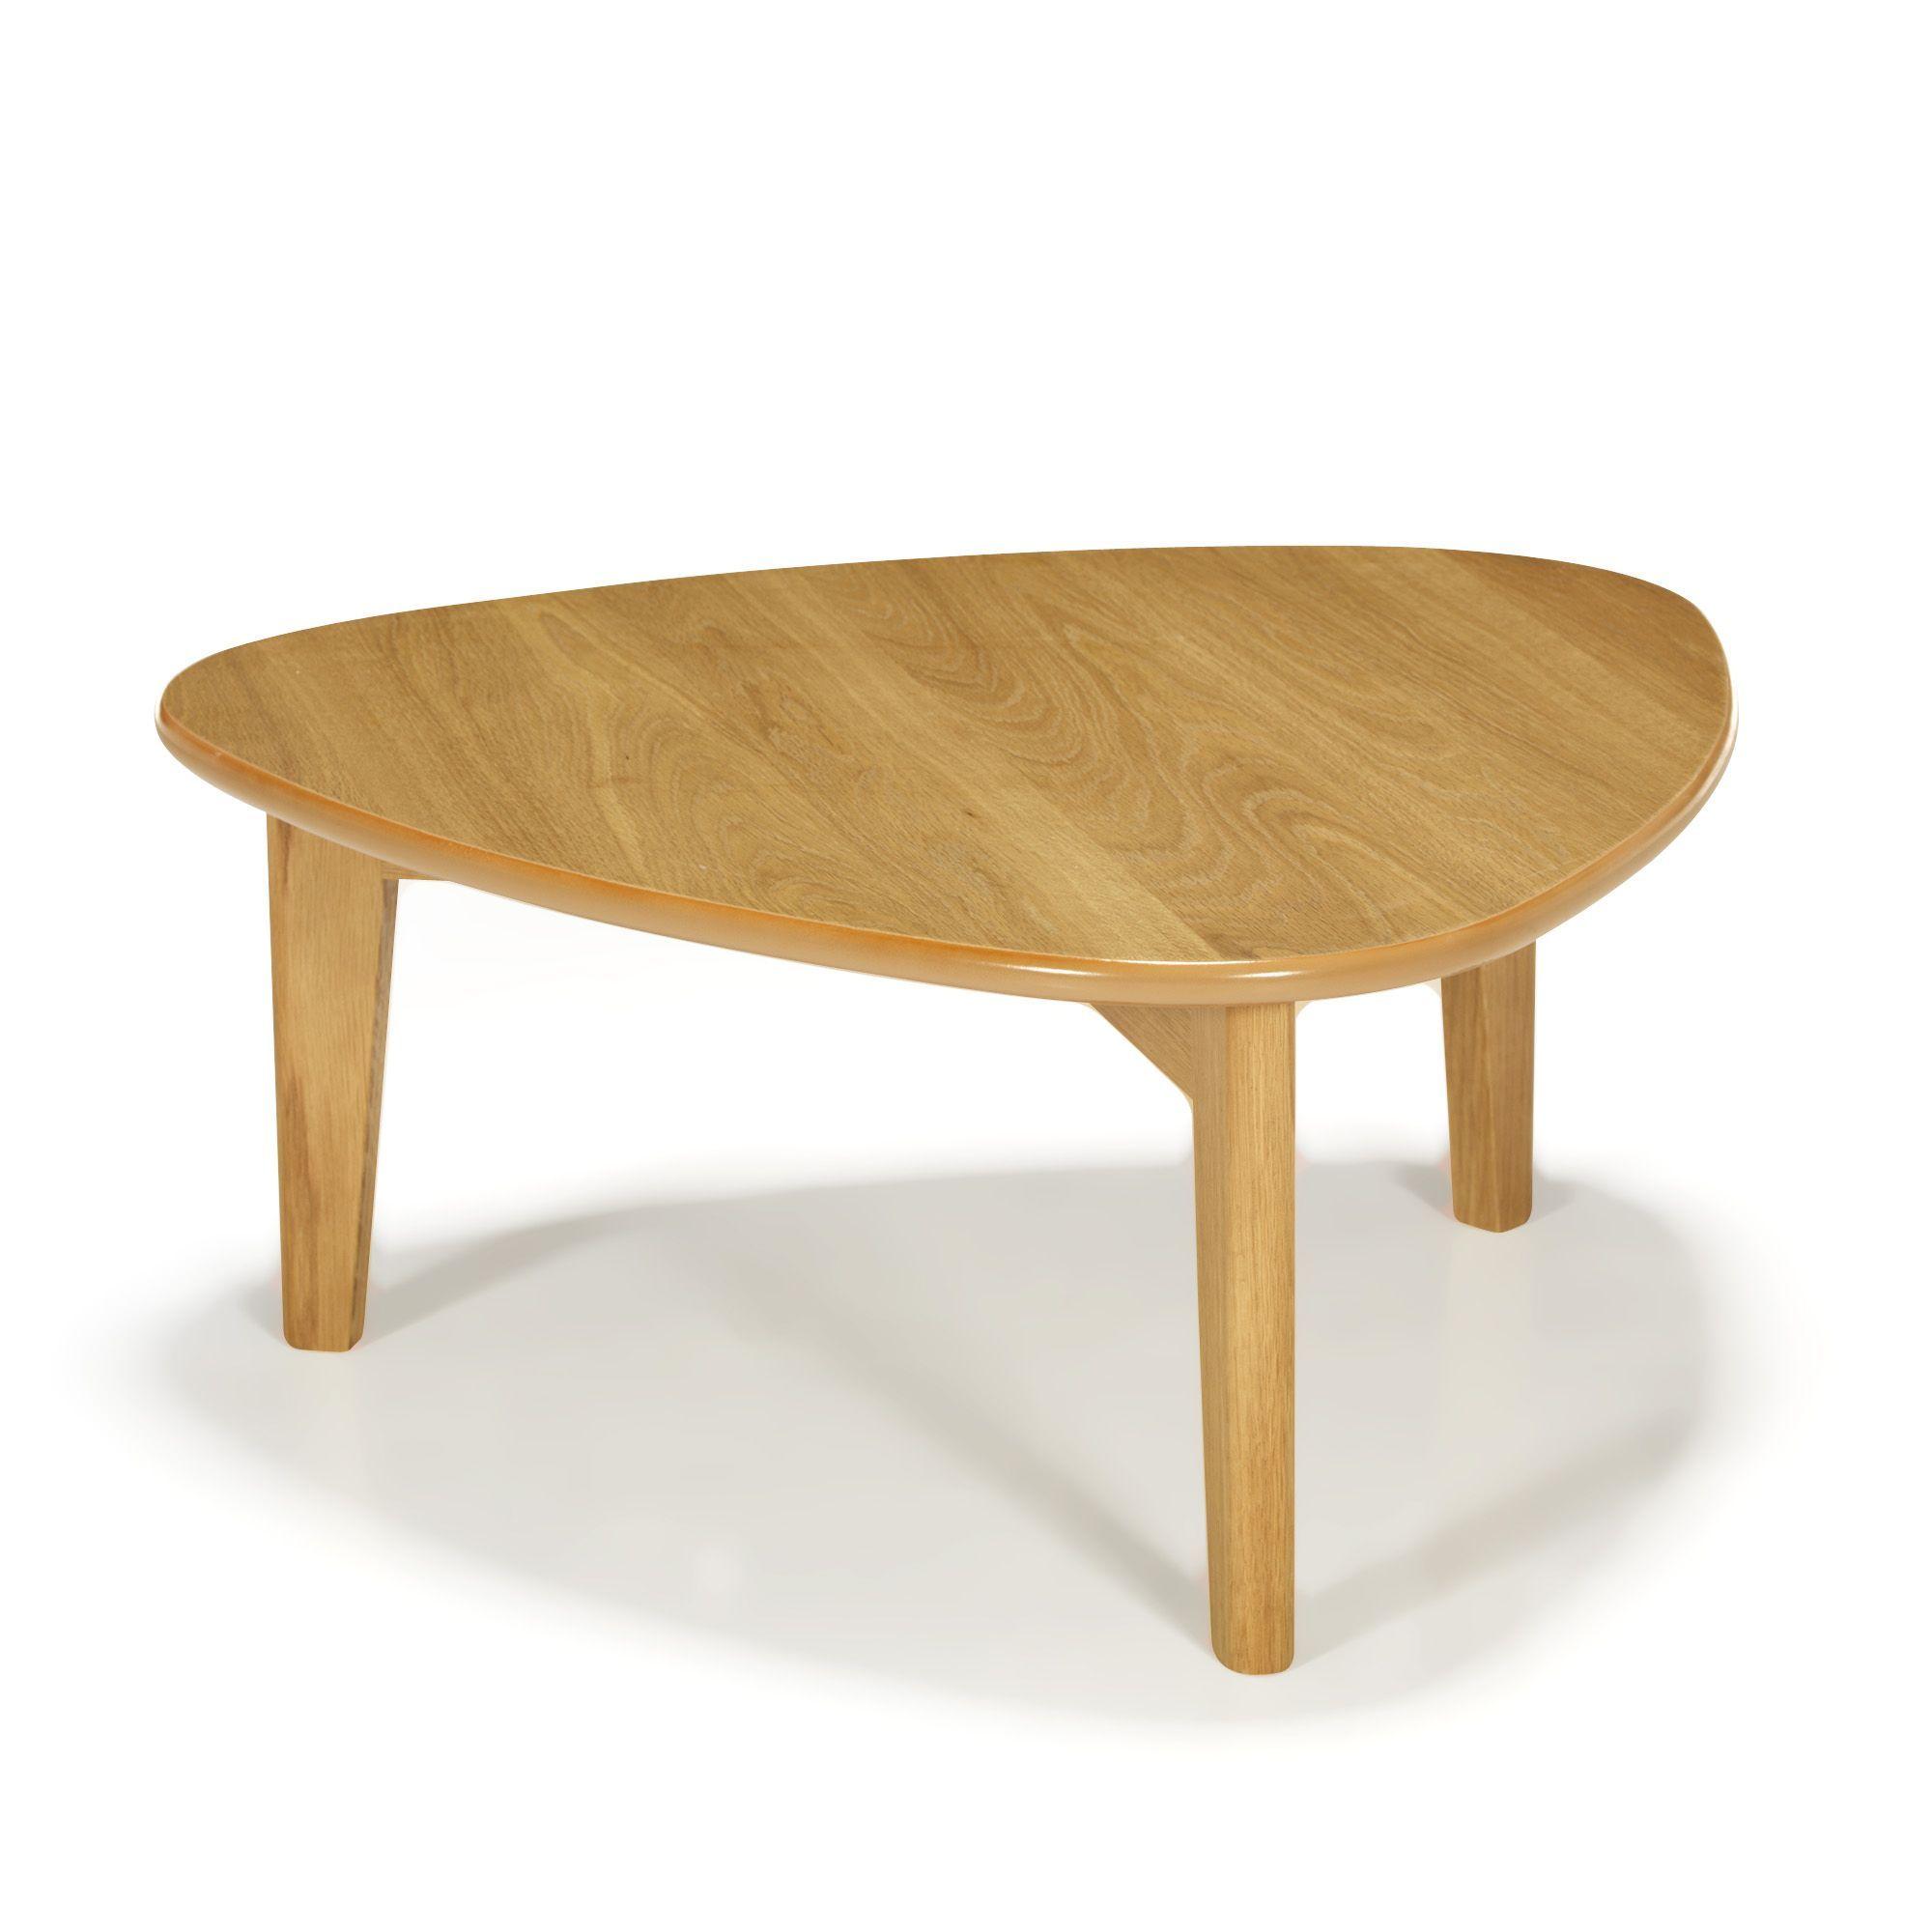 Siwa Table basse vintage scandinave en chªne 60cm